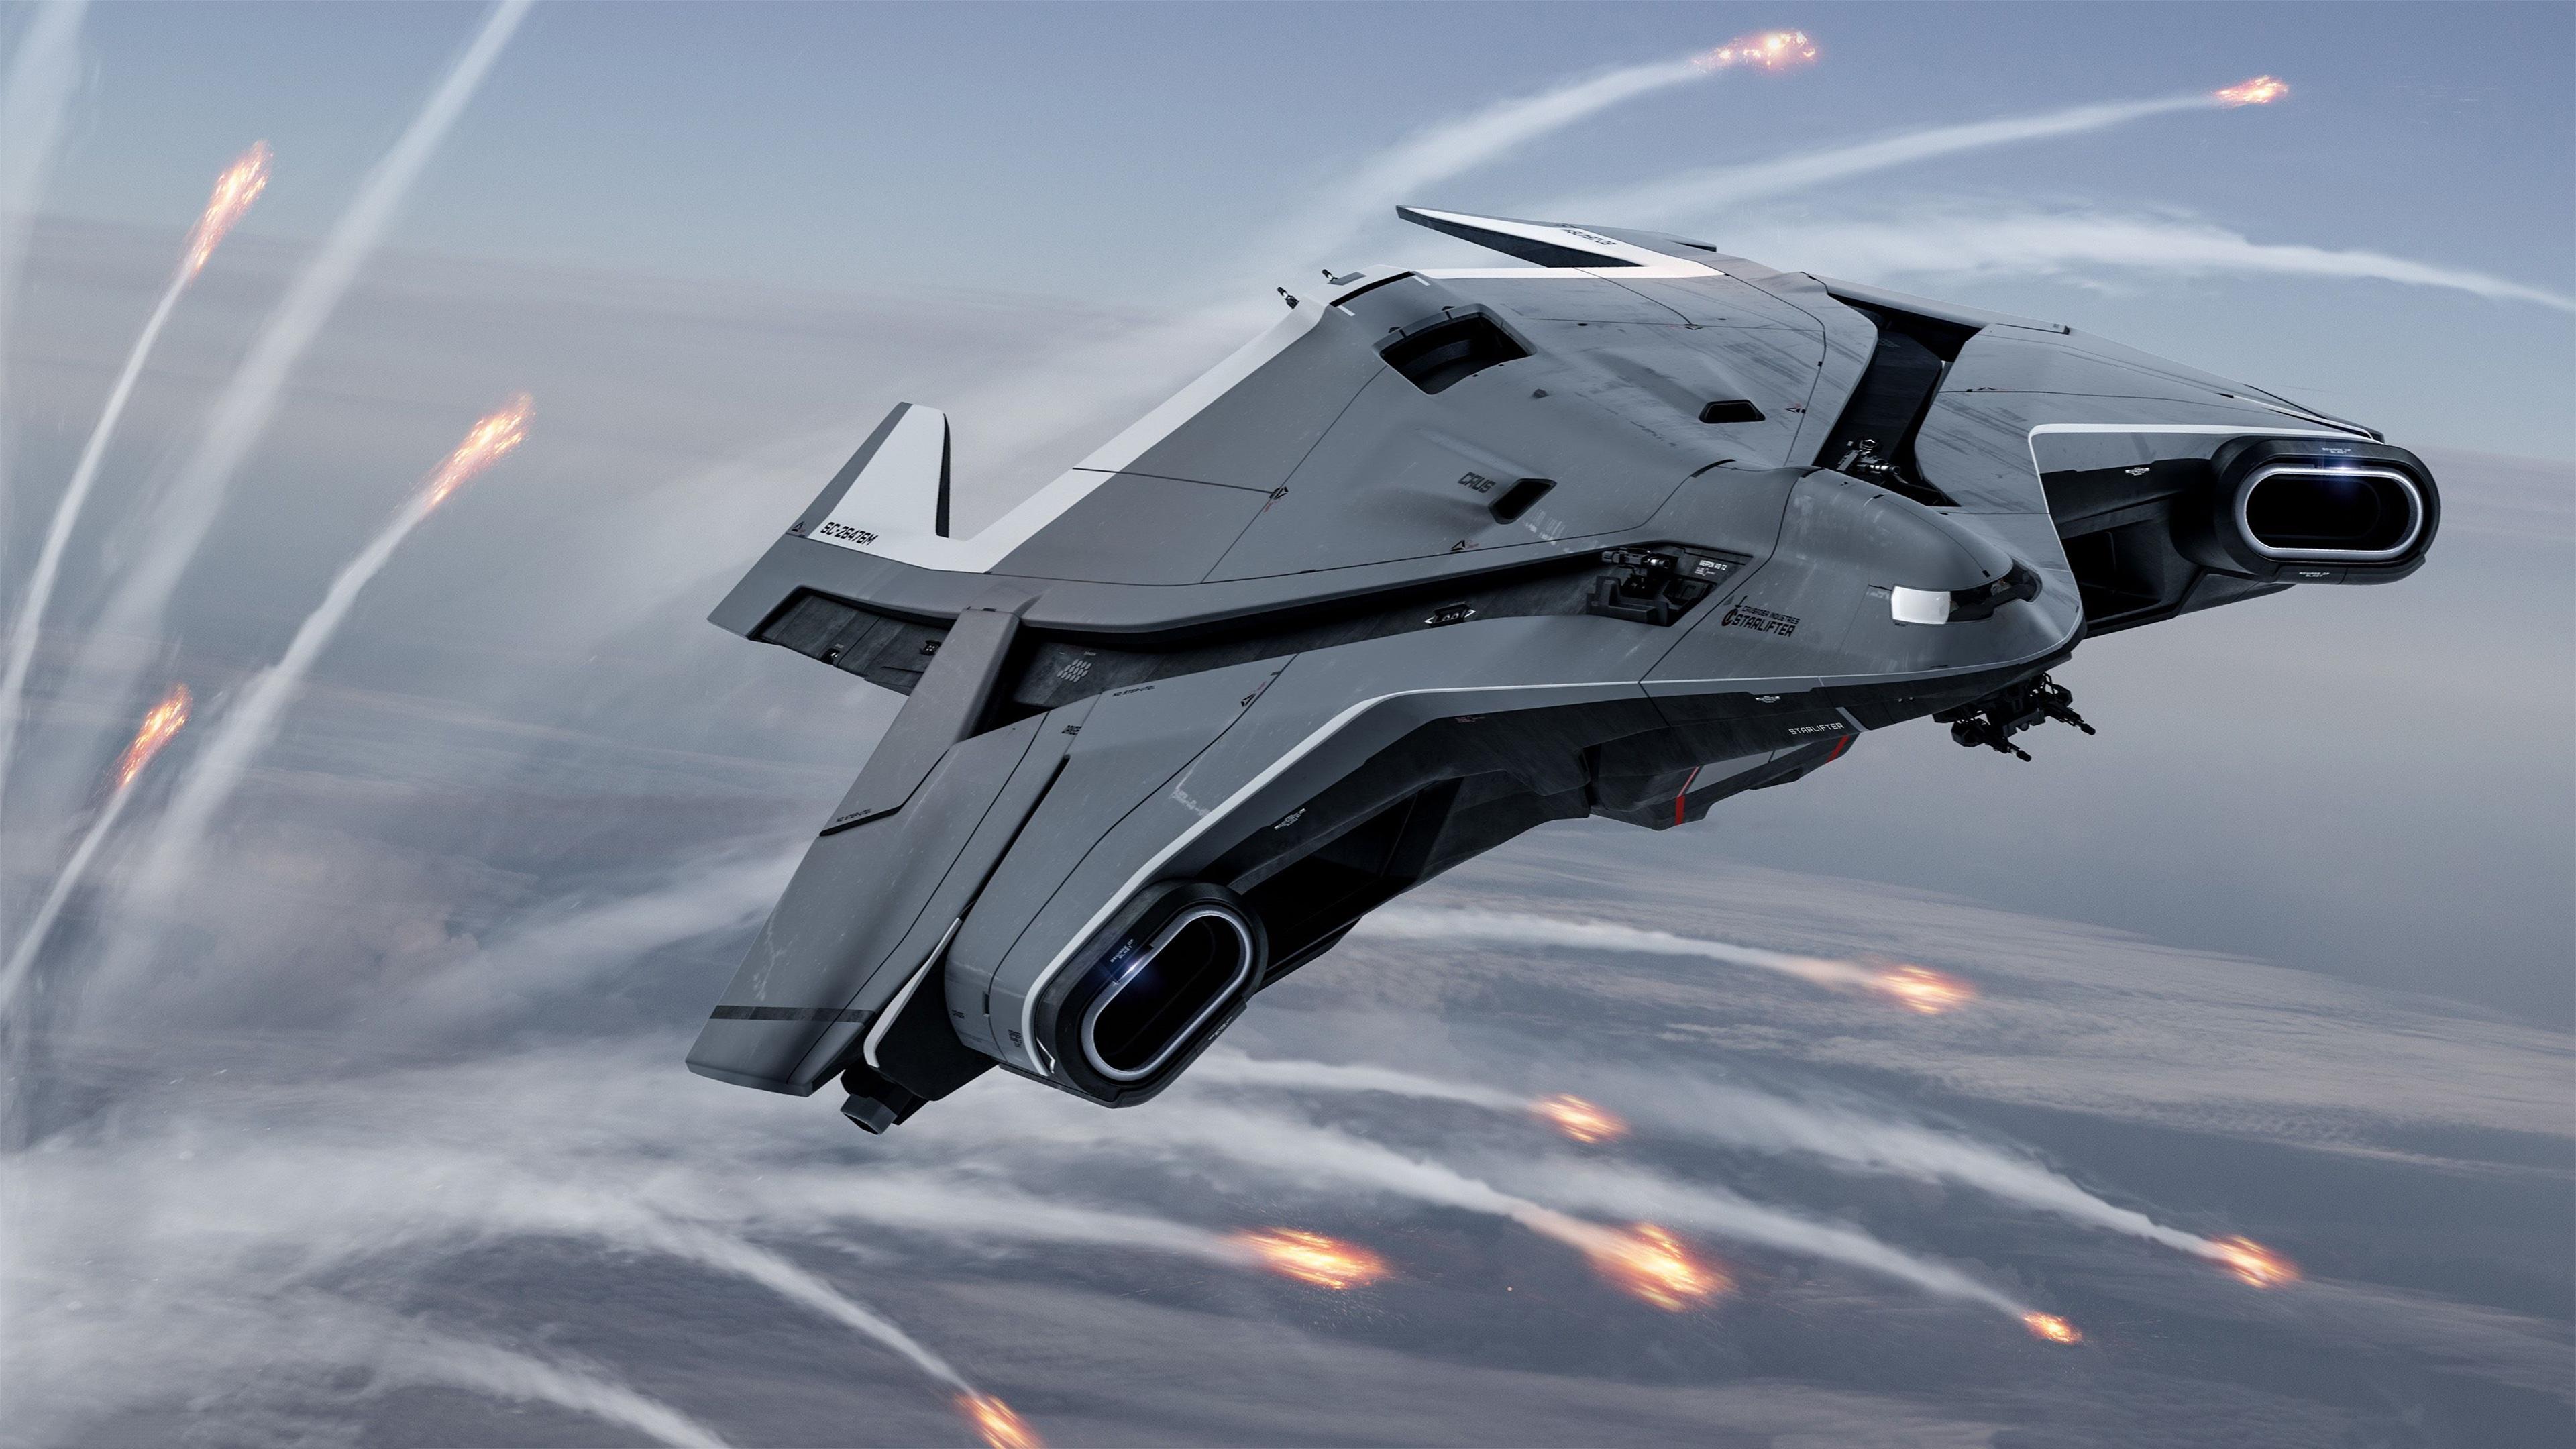 Star citizen spaceships 4k hd games 4k wallpapers - Spaceship wallpaper 4k ...